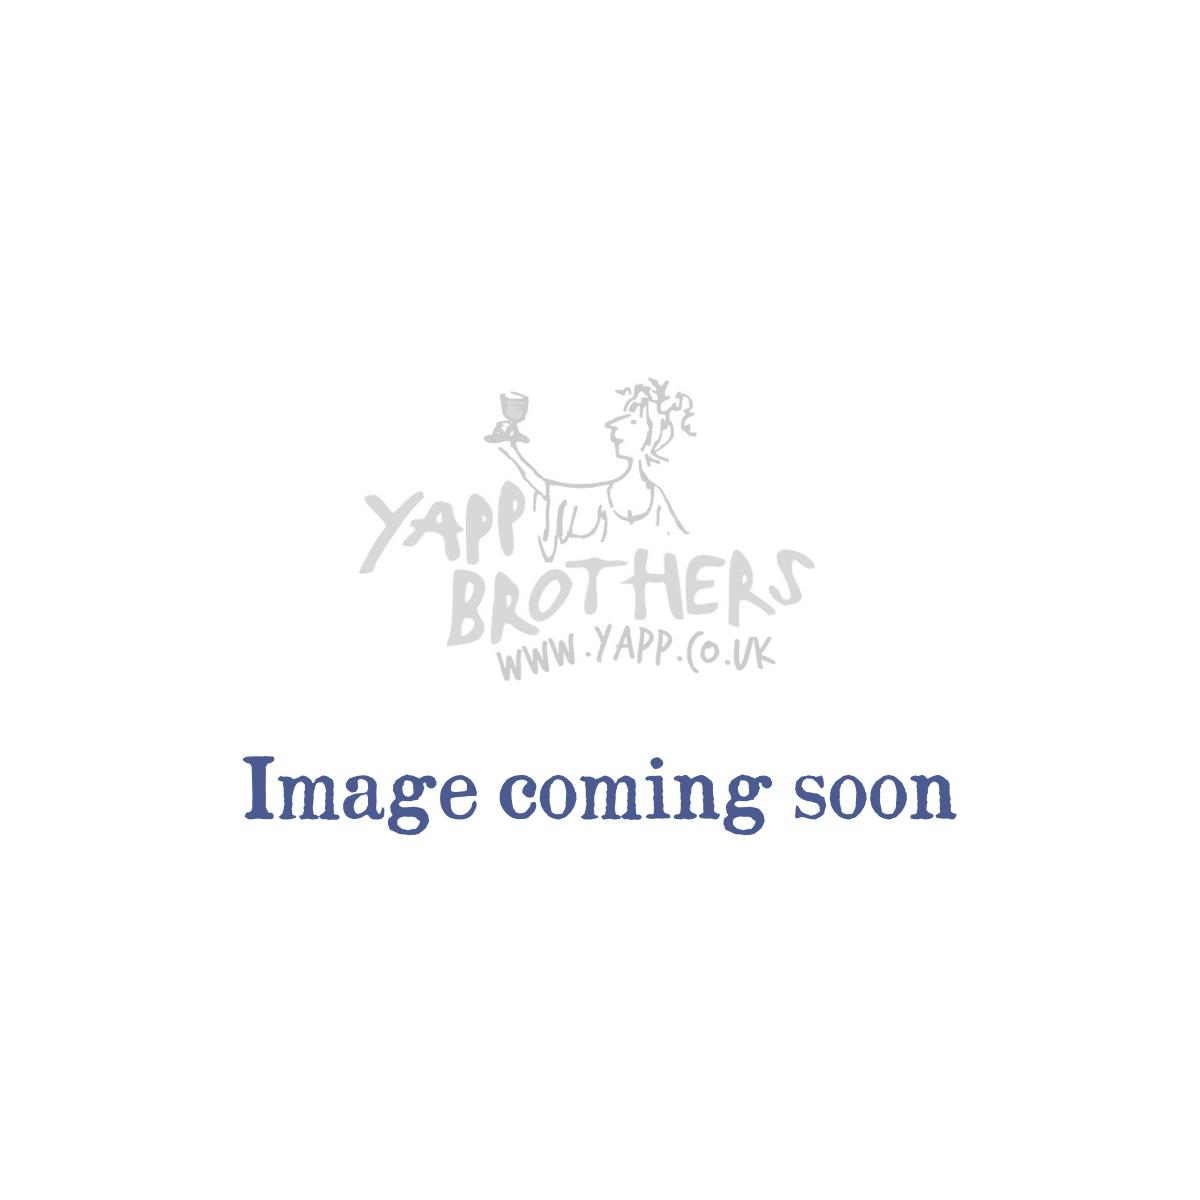 Busi Jacobsohn: 'Cuvée Brut' 2018 - Bottle Rear Label